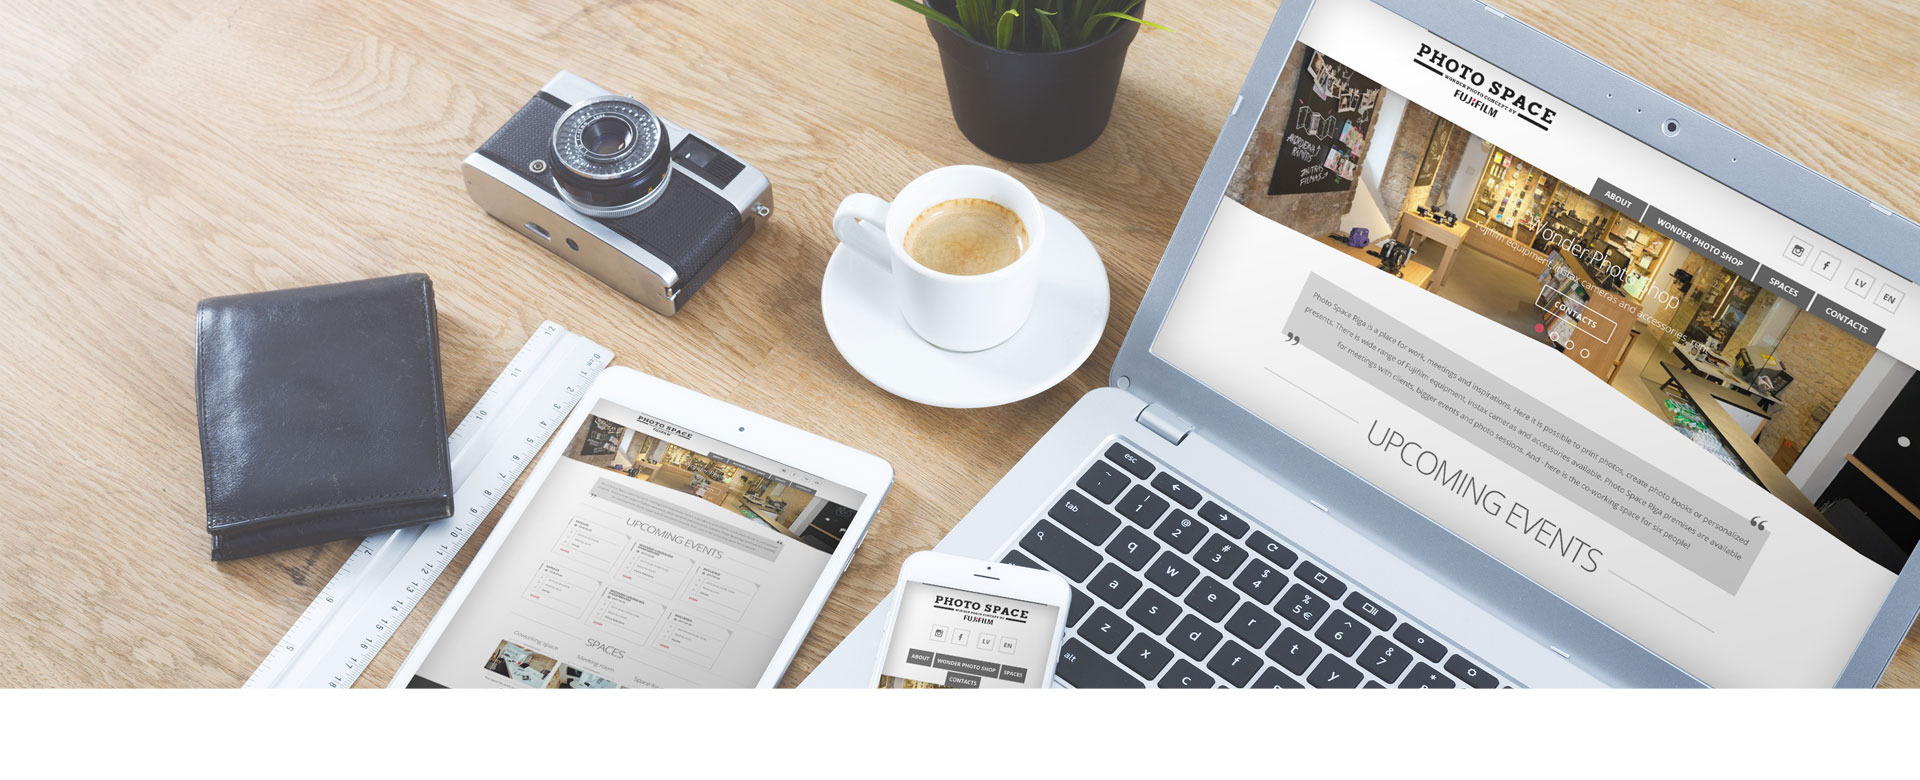 Fujifilm photospace